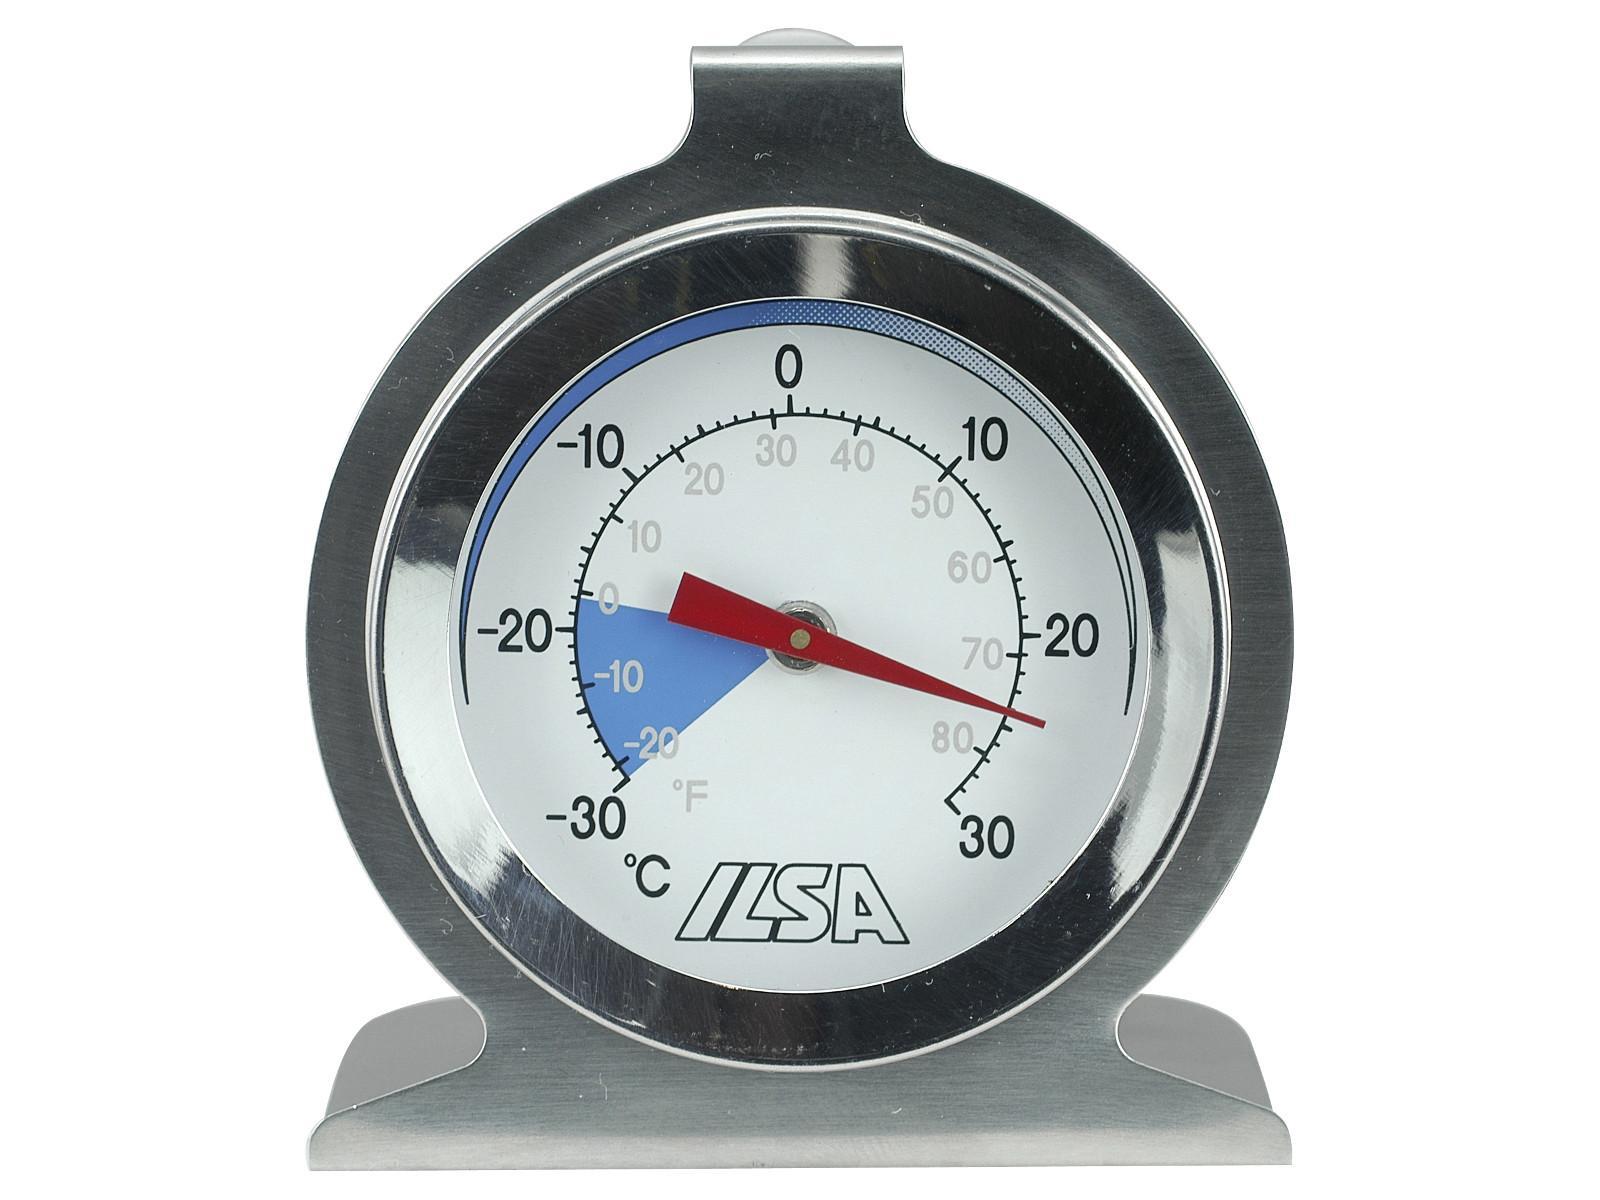 Kühlschrank Thermometer : Ilsa kühlschrankthermometer gefrierschrankthermometer edelstahl